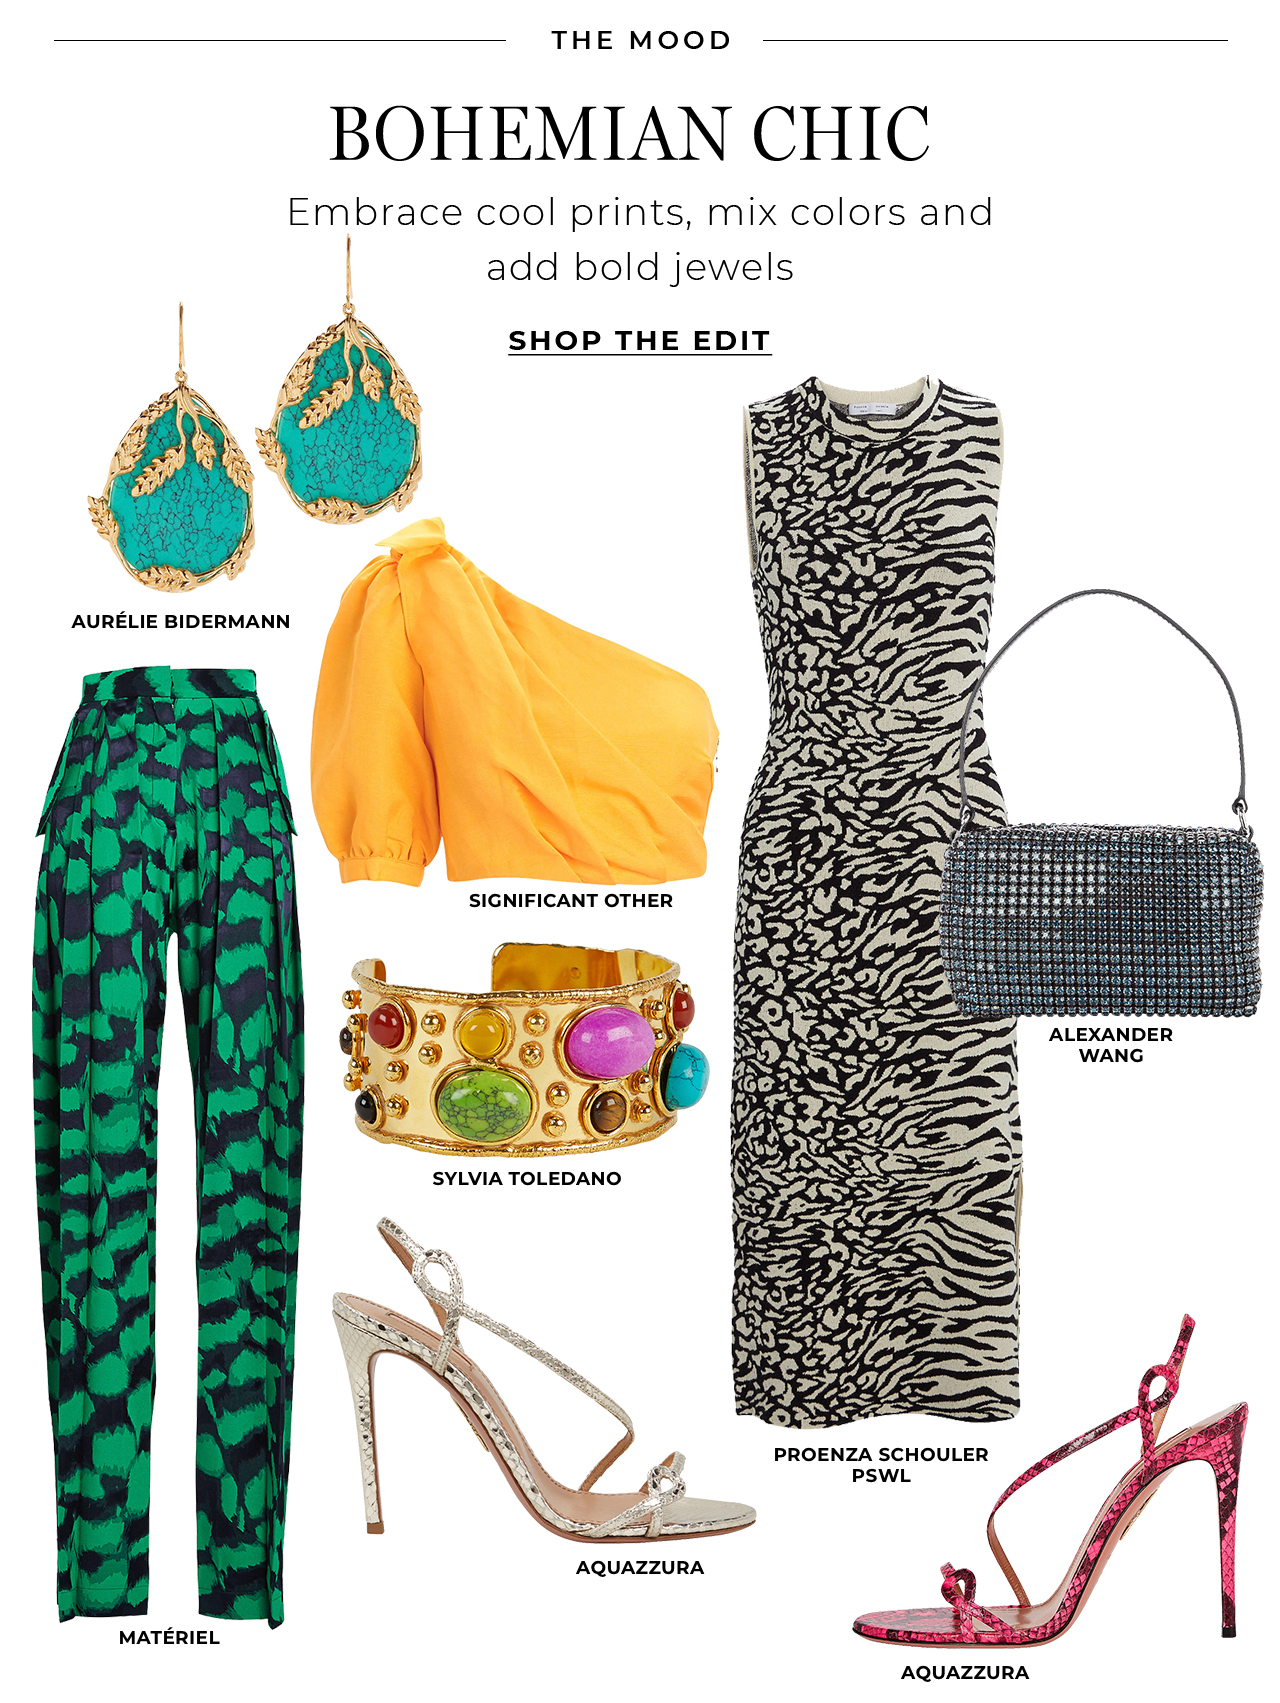 Embrace bohemian chic prints, mix colors and add bold jewels